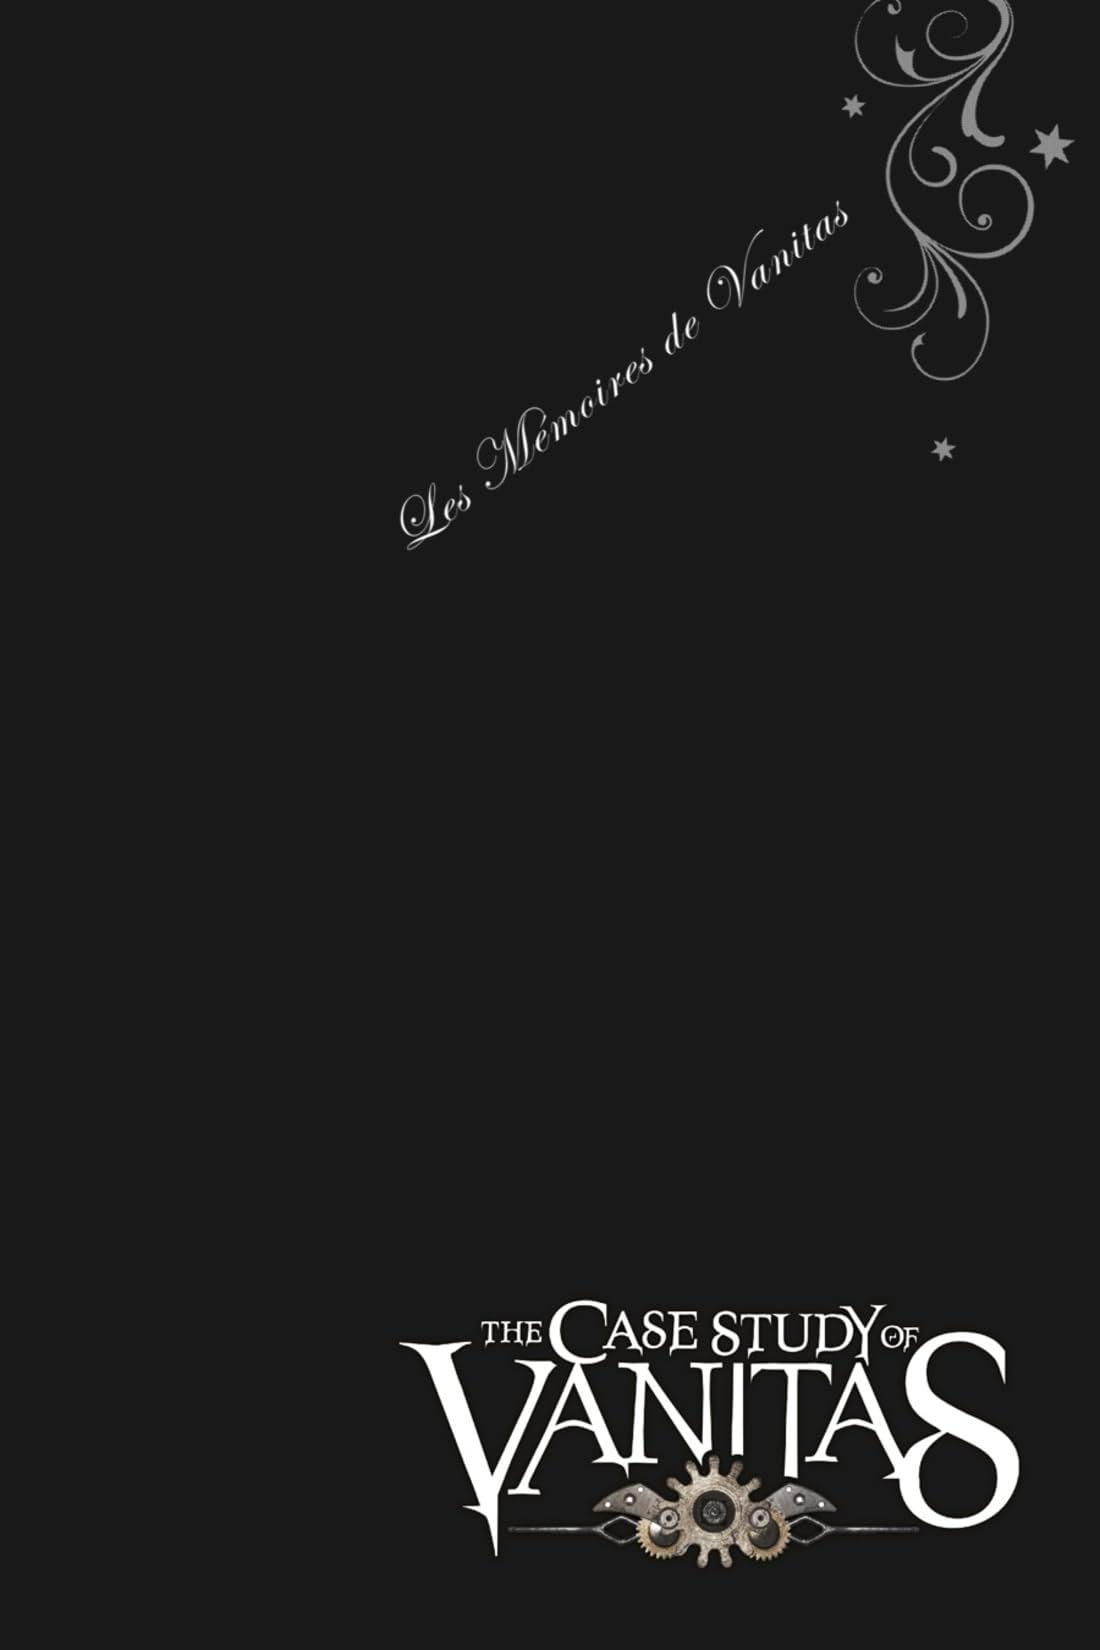 The Case Study of Vanitas Vol. 1